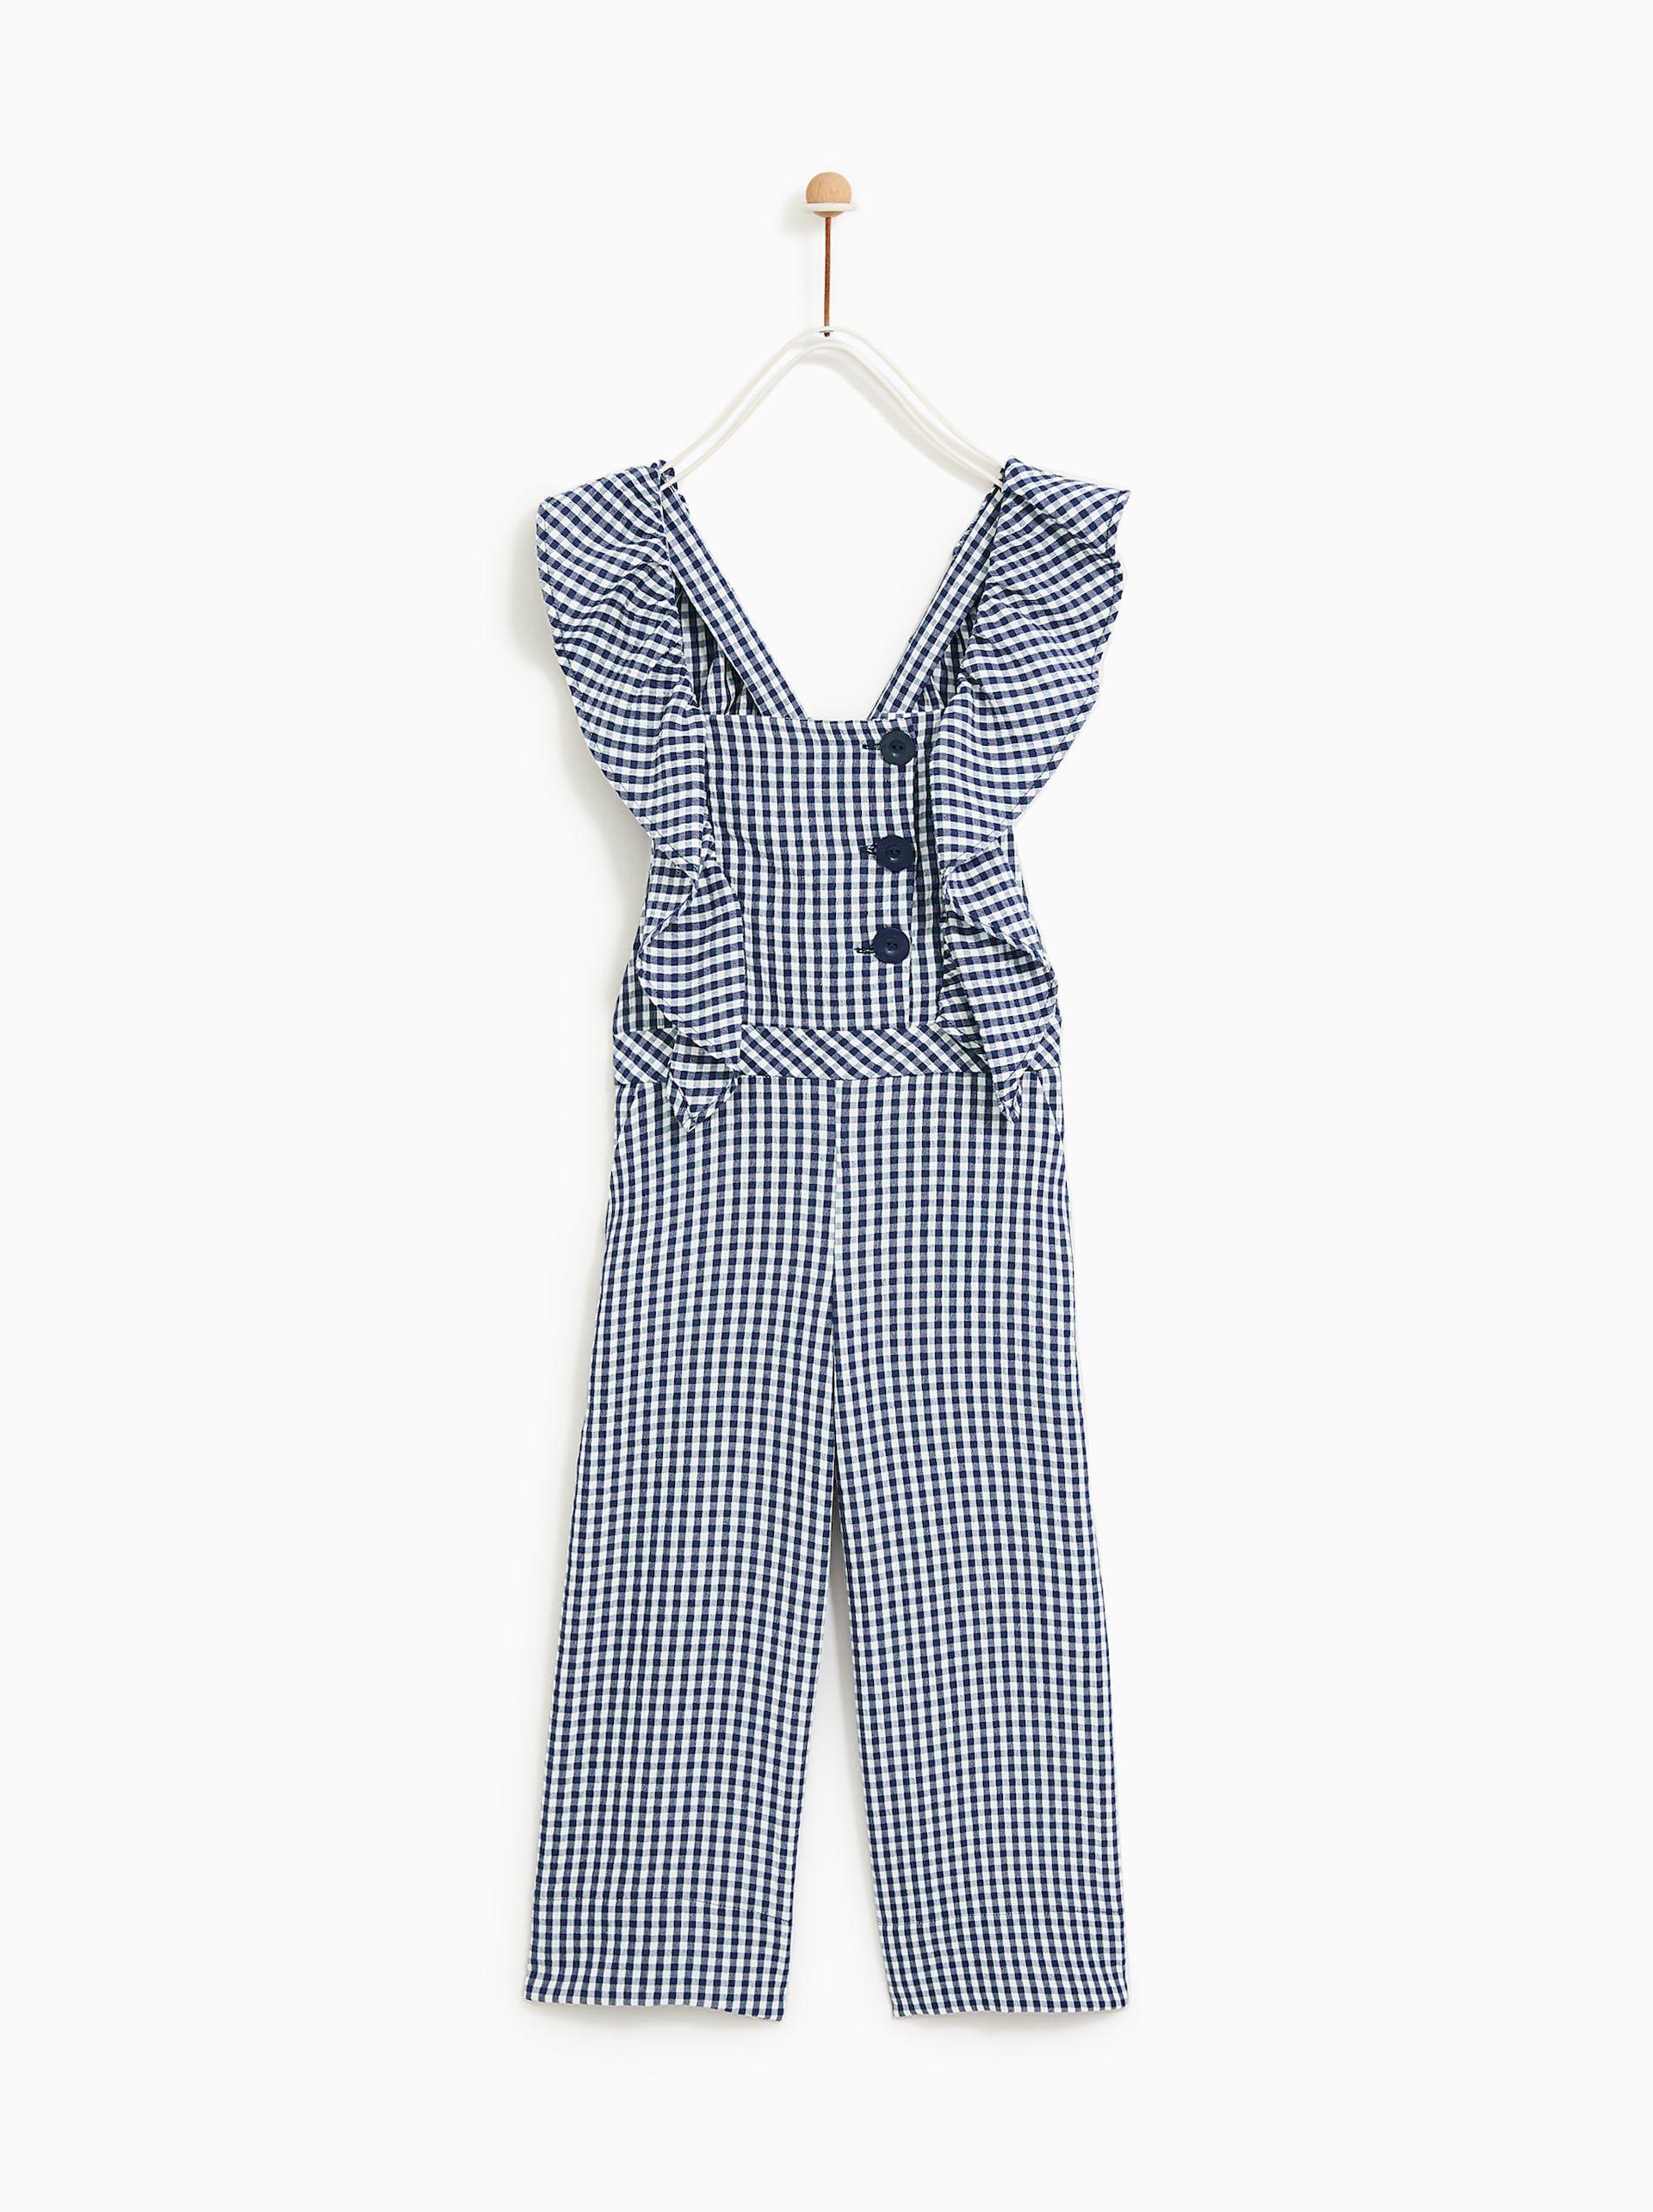 Toddler Kid Baby Girl Strap Sleeveless Romper Halter Heart Jumpsuit Bodysuit Shorts Overalls Summer Outfits Set